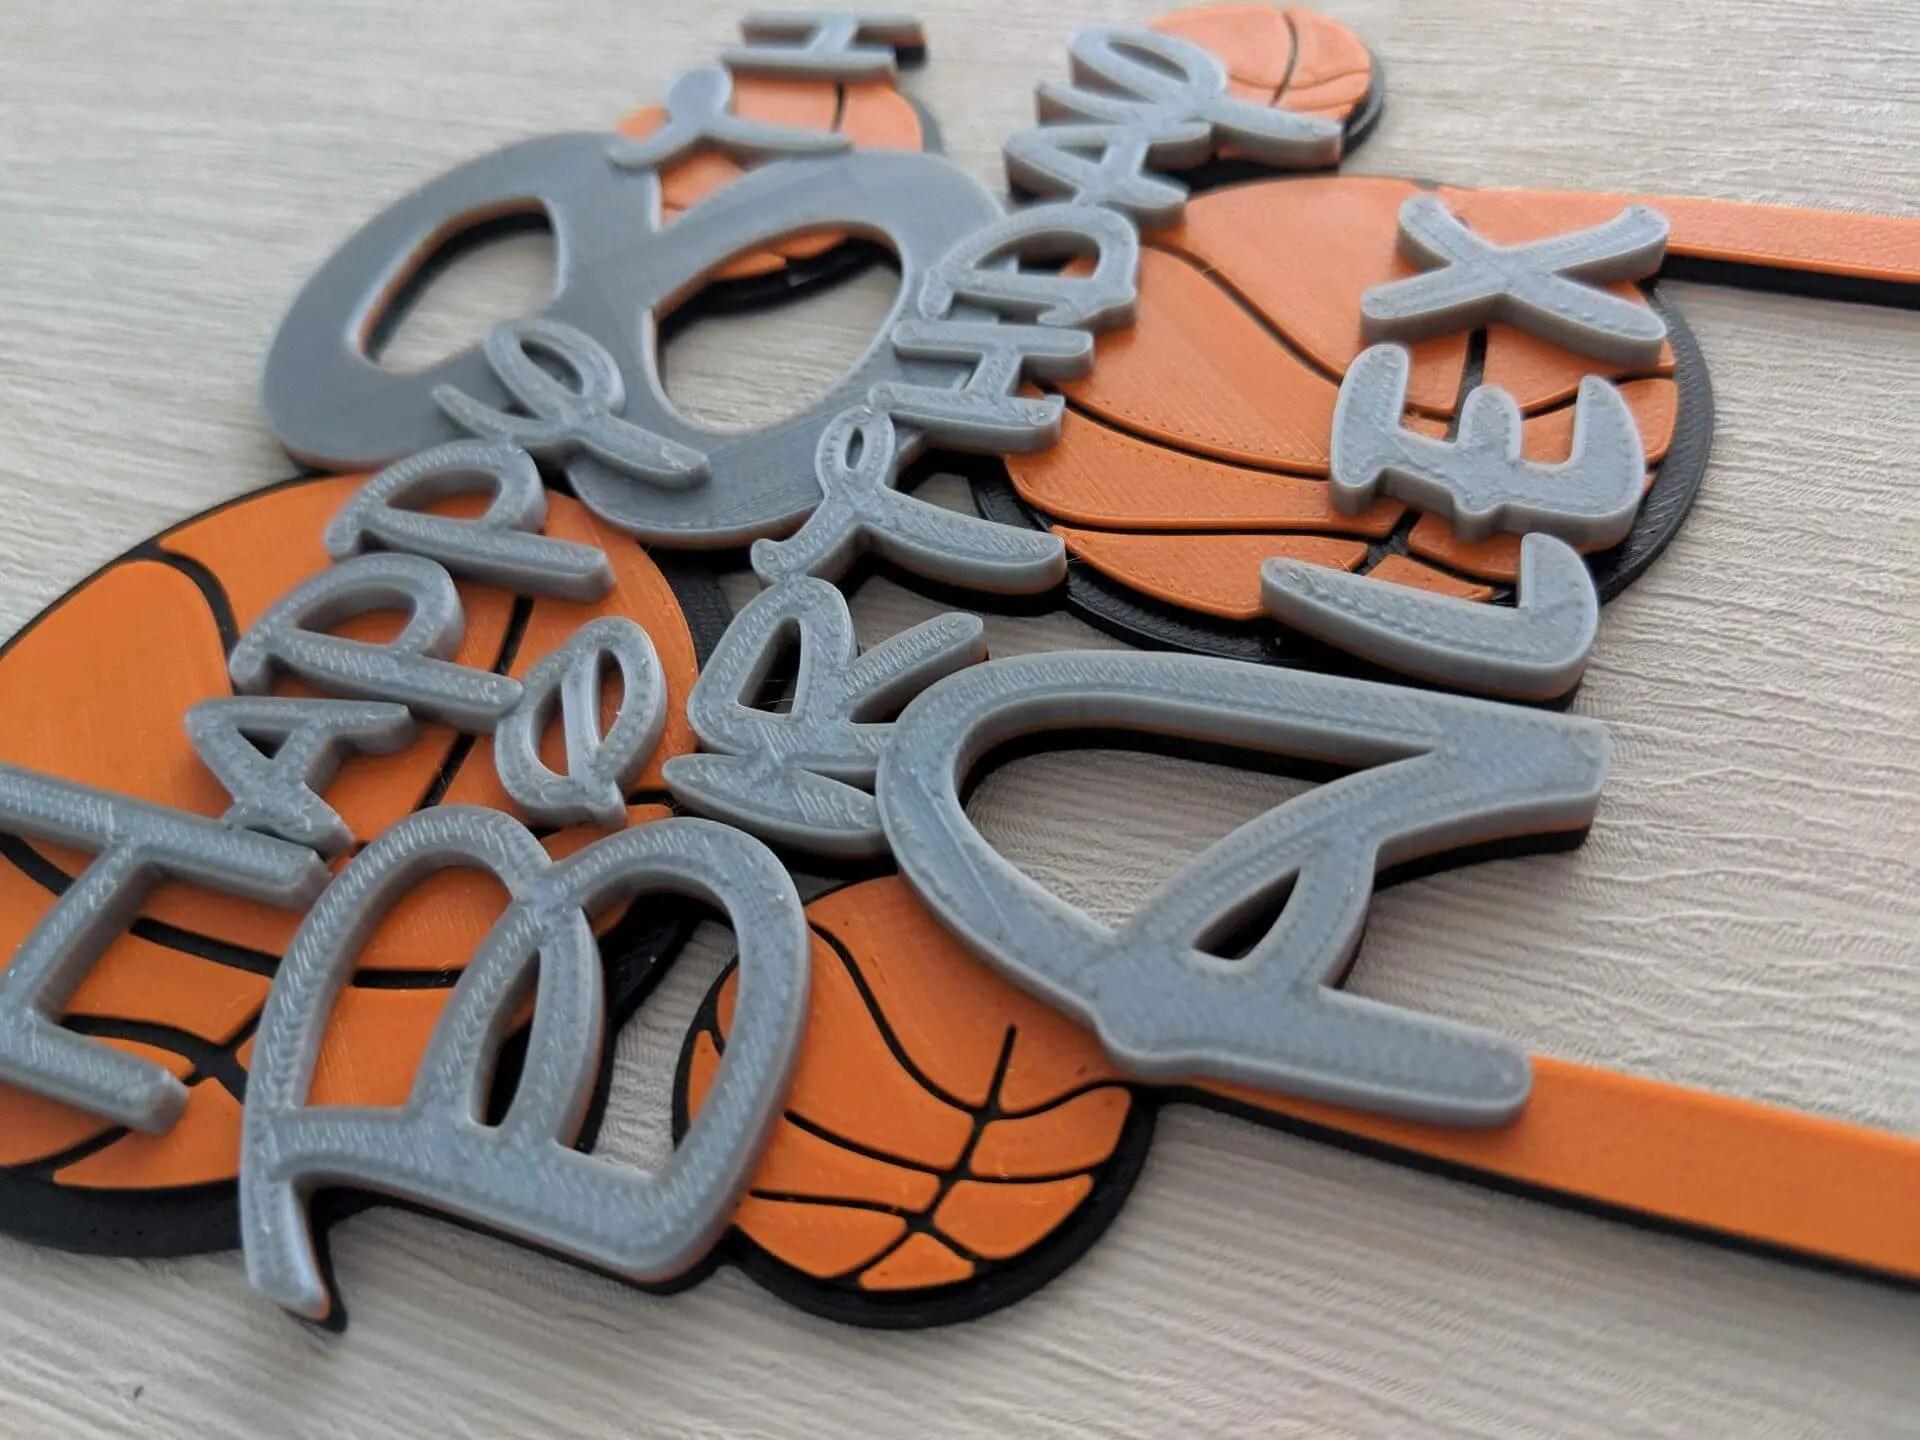 Prime Personalised Basketball Birthday Cake Topper Dalewood Designs Gb Funny Birthday Cards Online Benoljebrpdamsfinfo